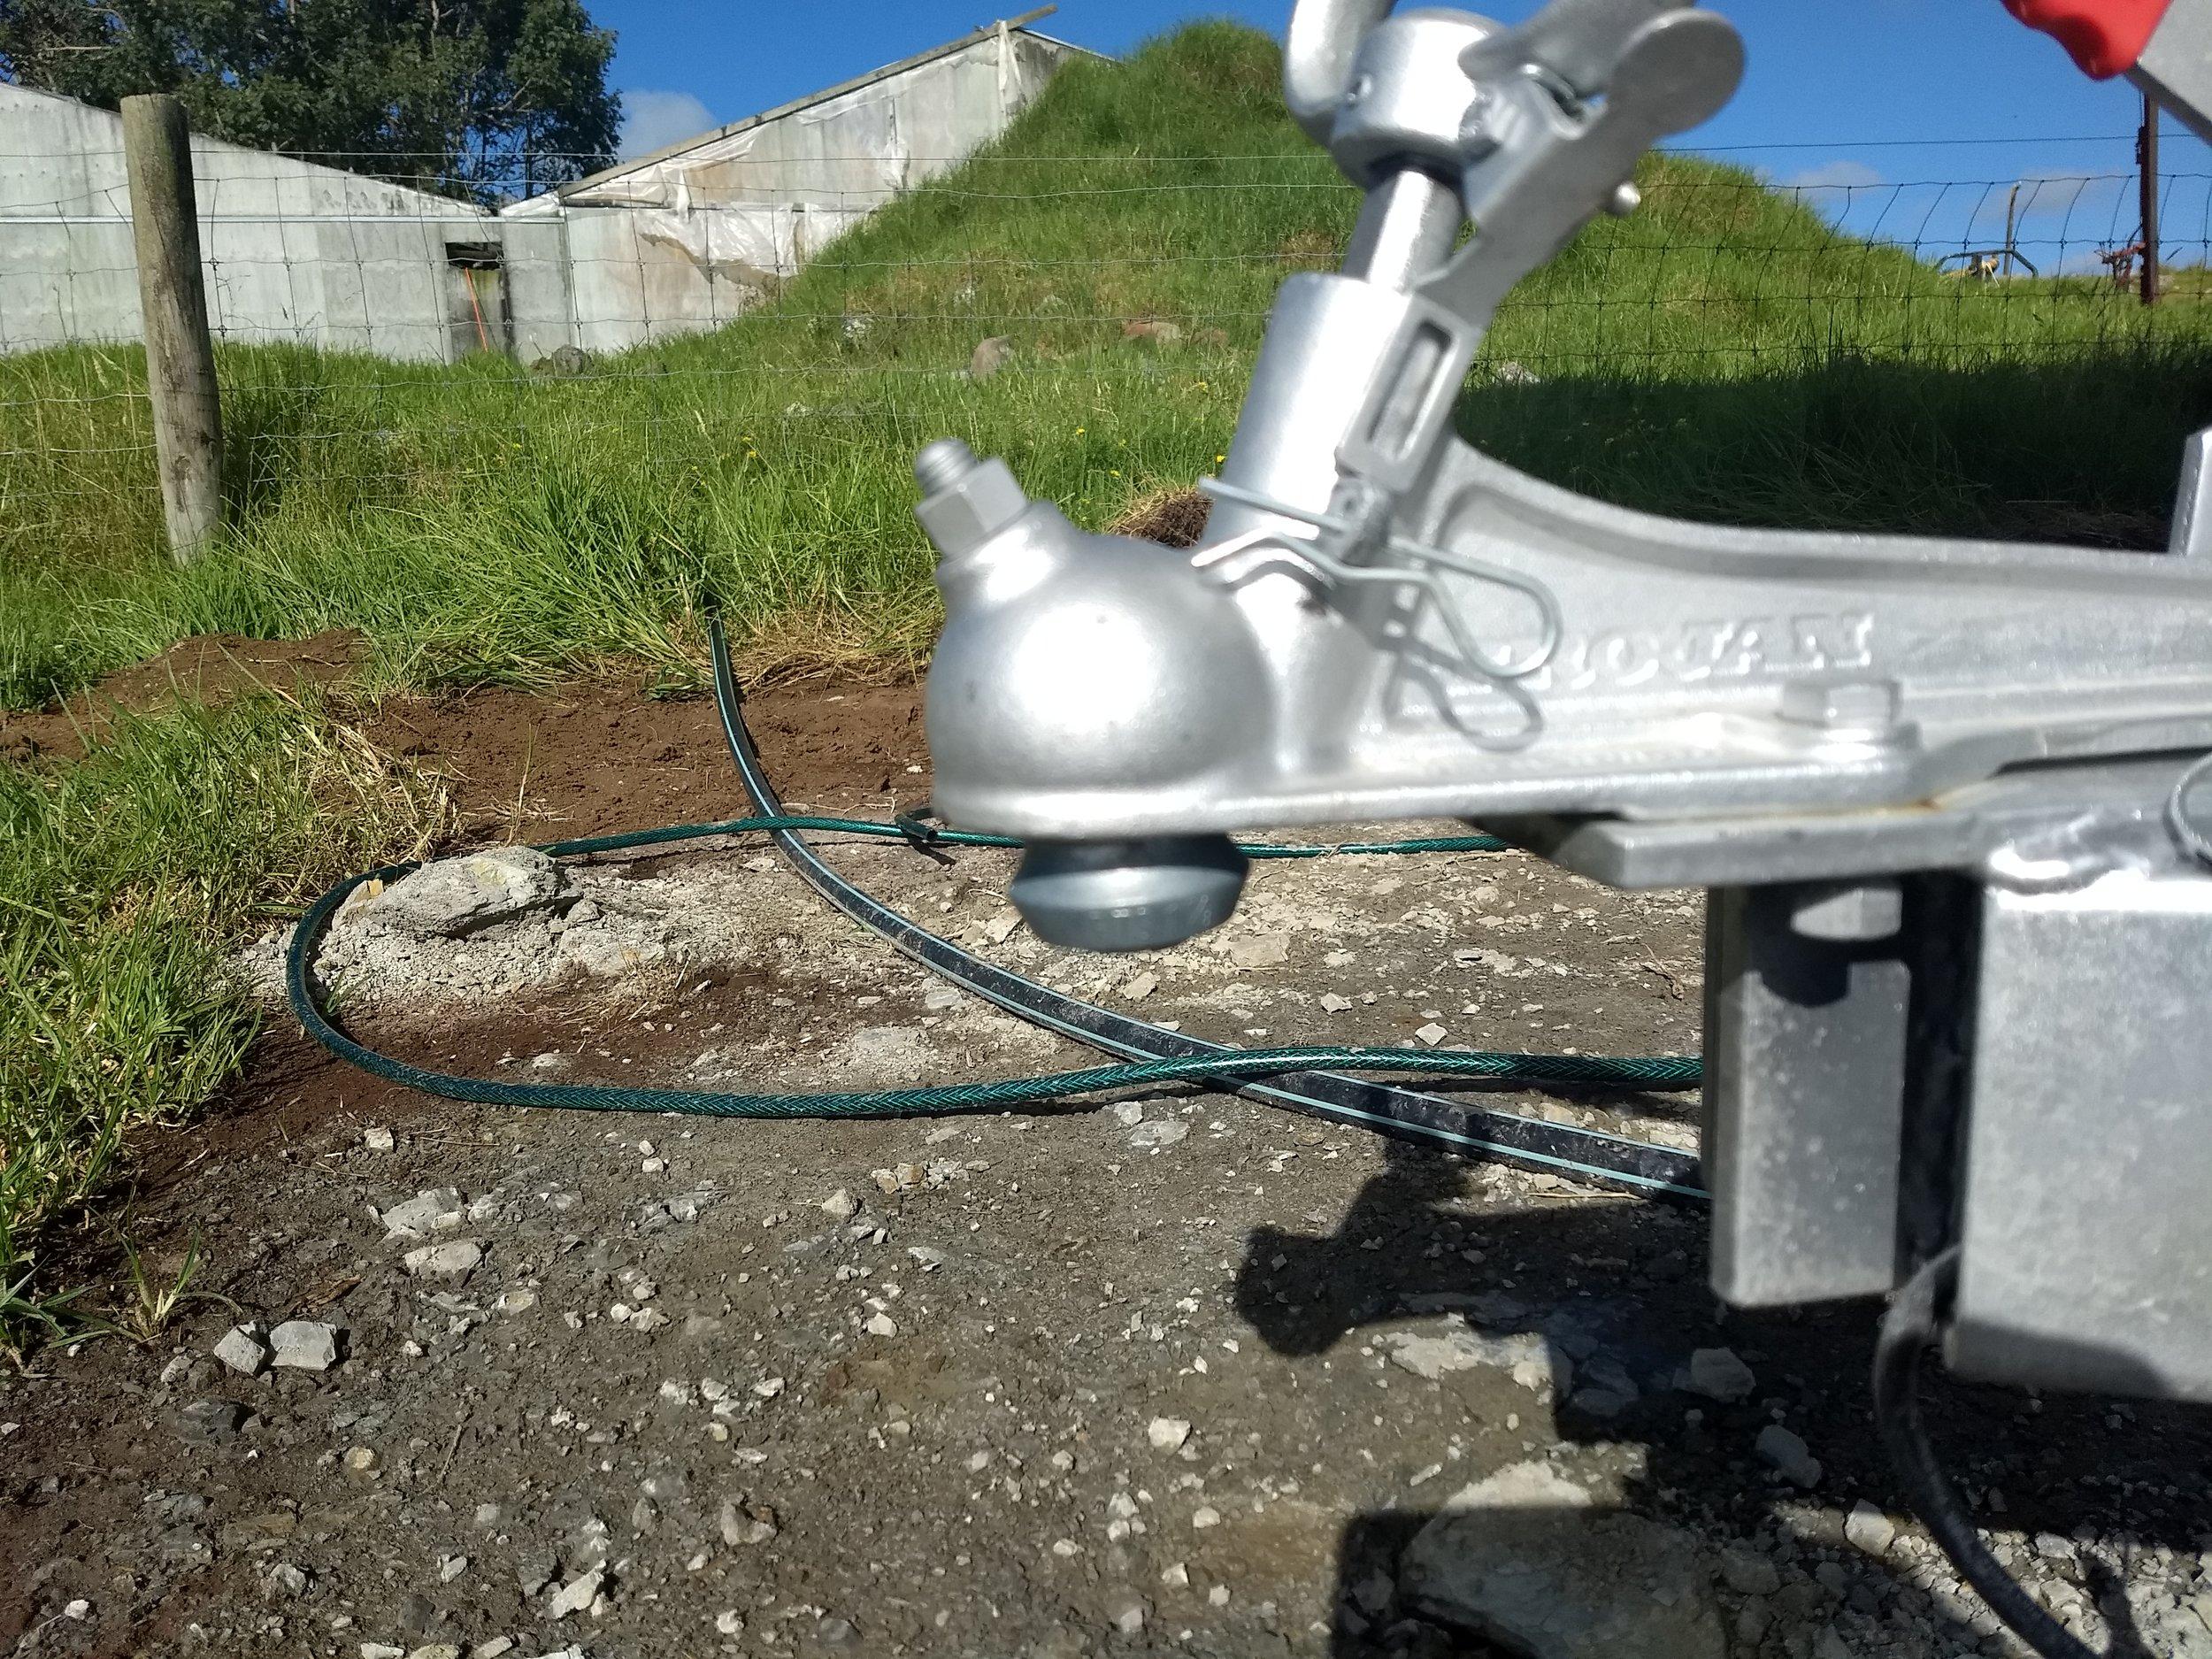 Tow-bar Lock